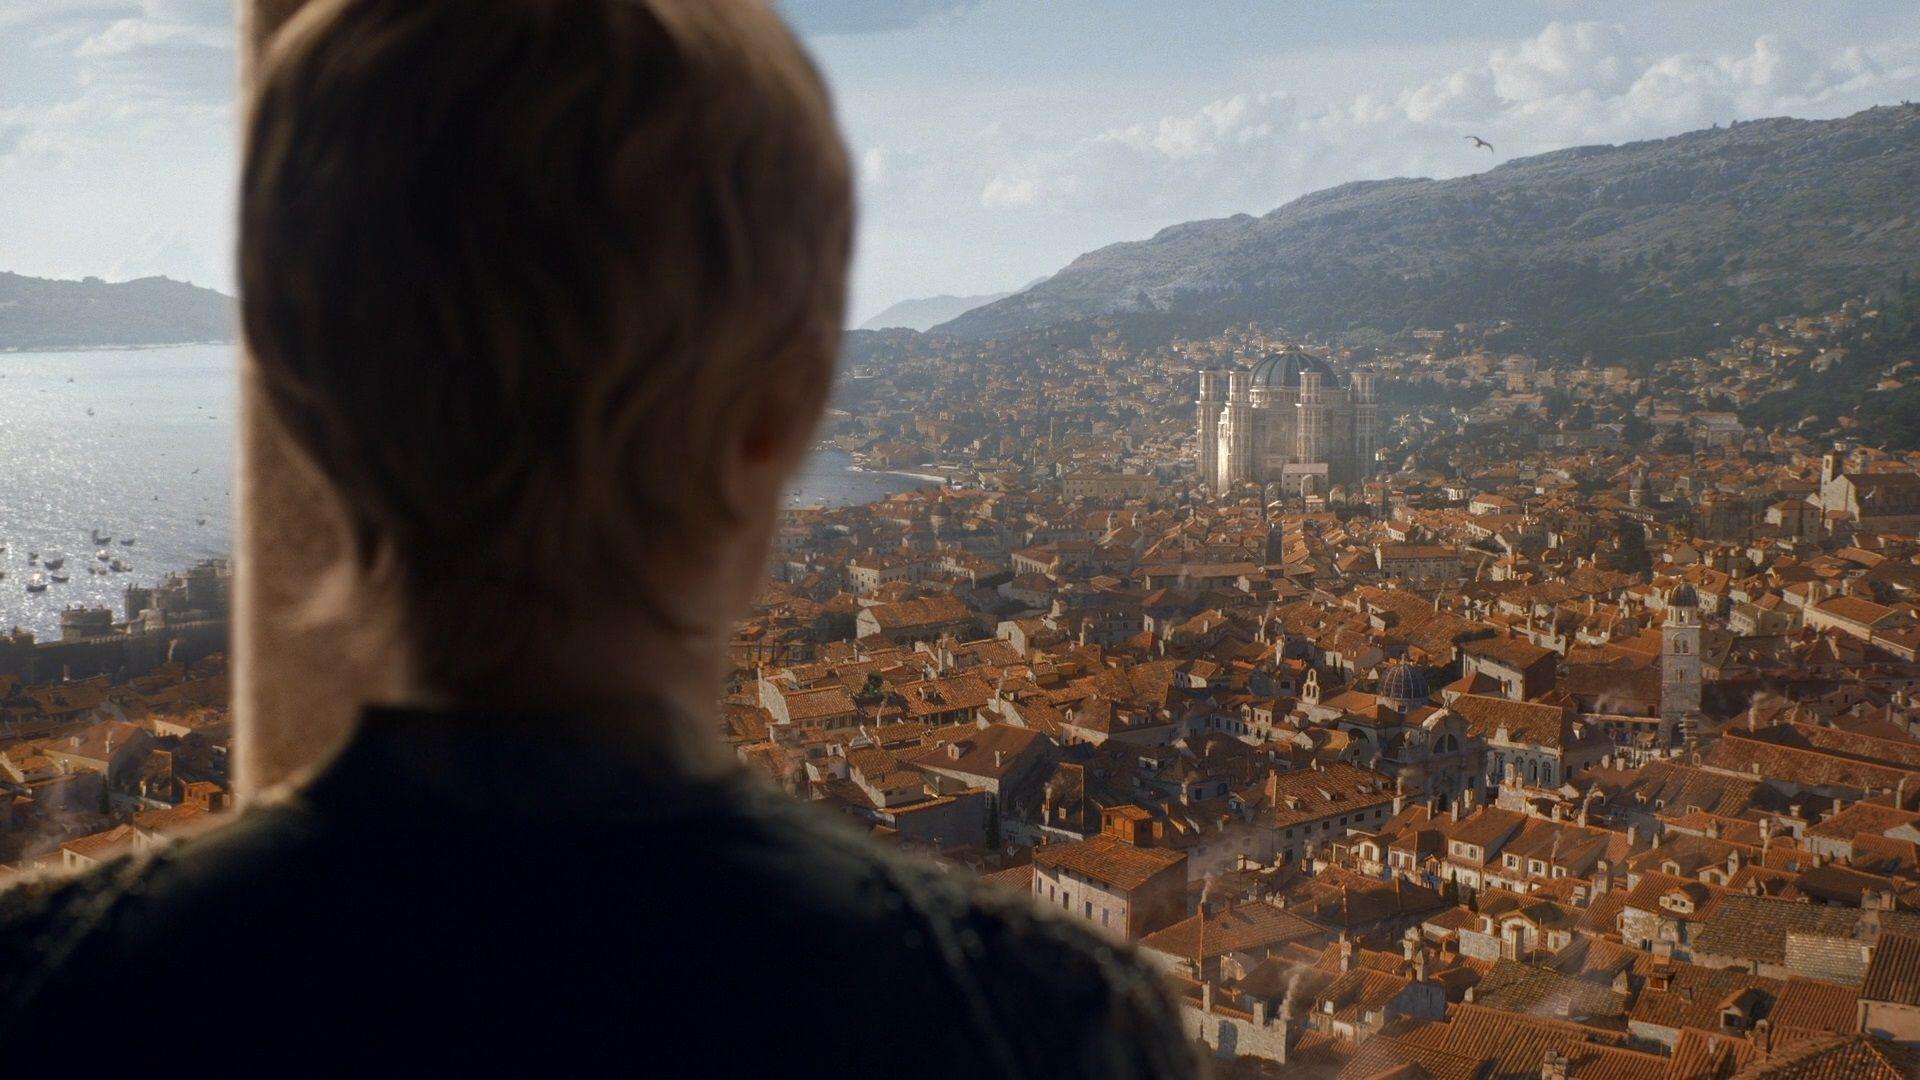 Game of Thrones Season 7 Episode 3 recap The Queens